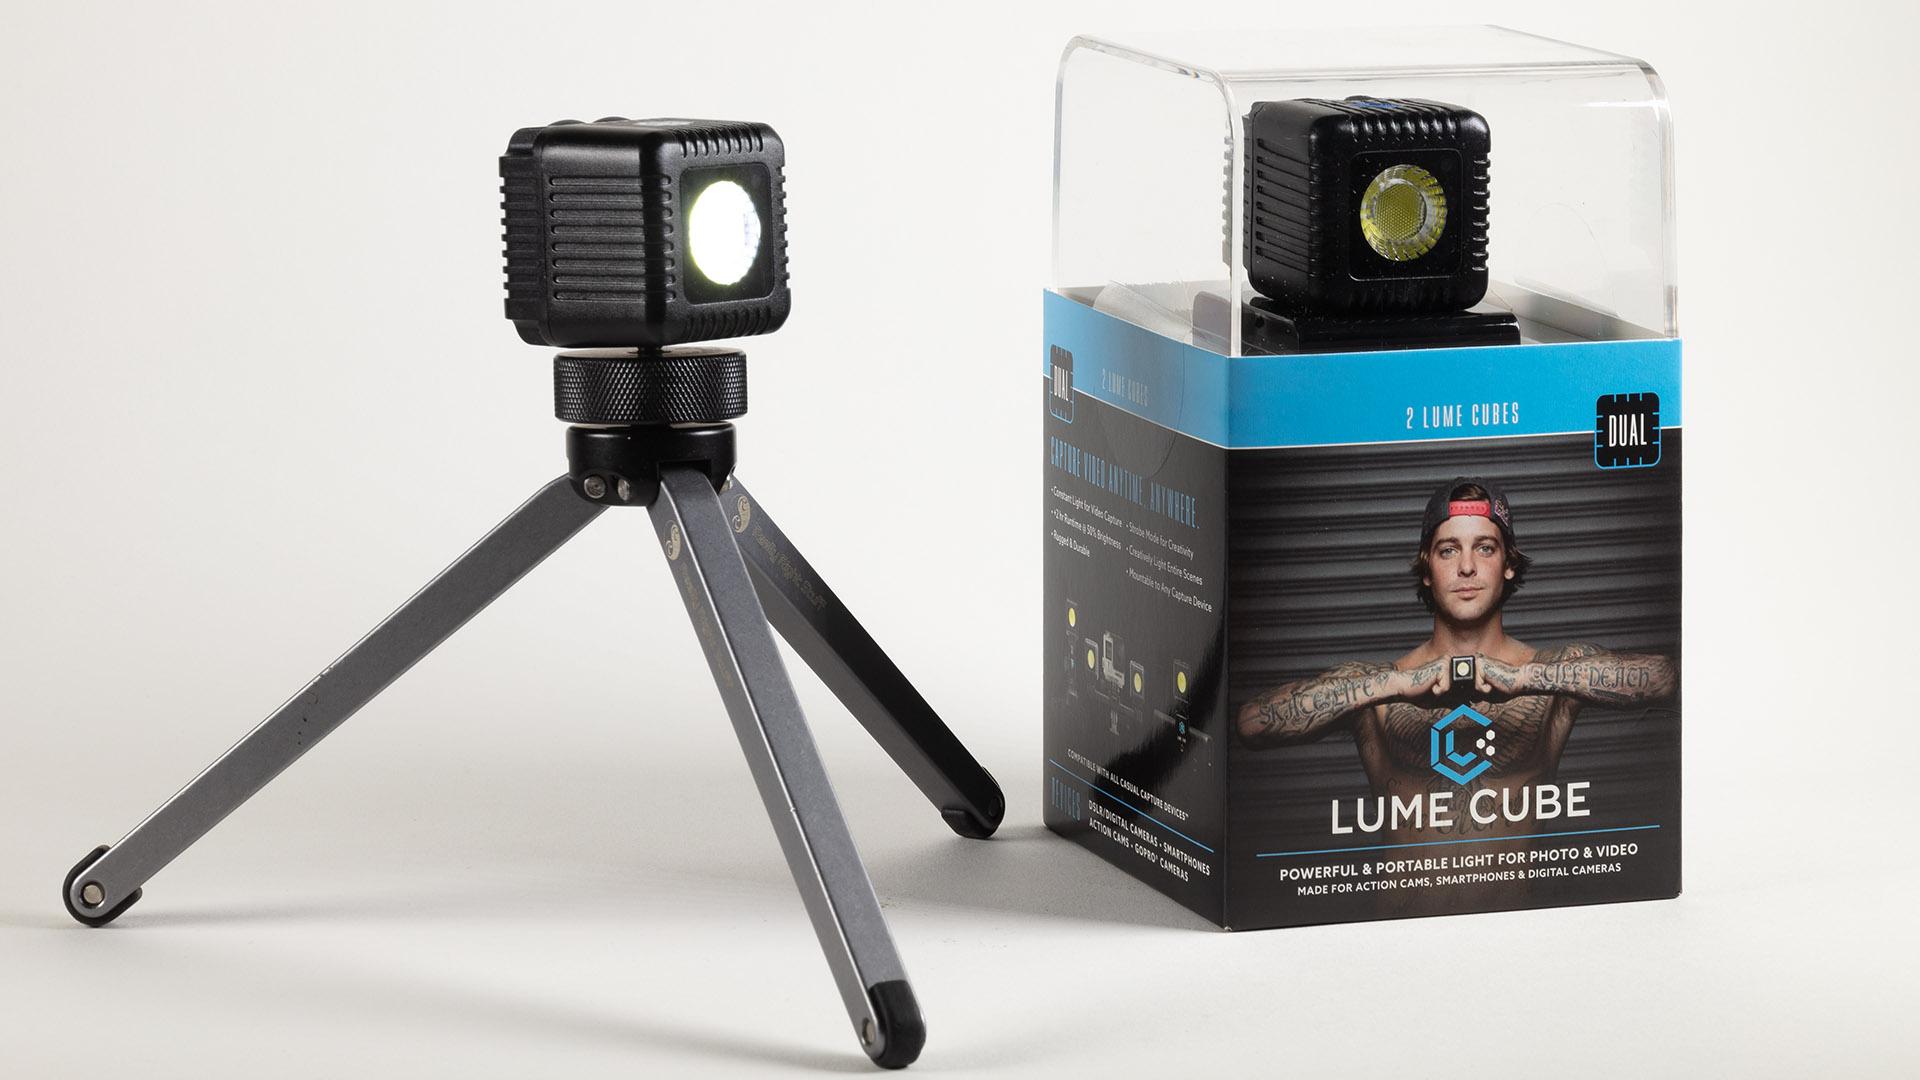 2980-0005 LumeCube Featured Photo